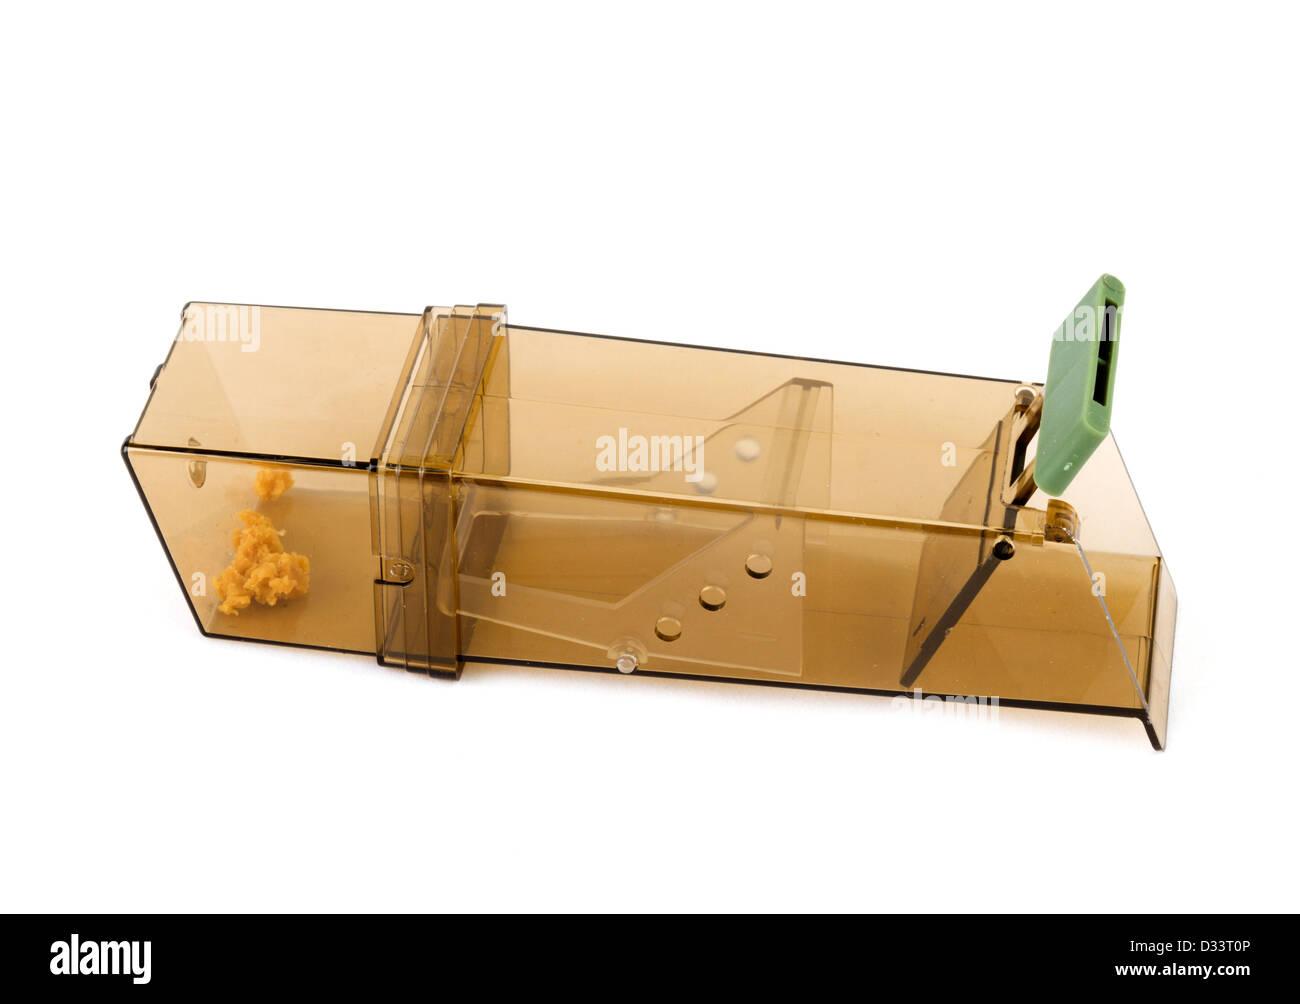 Humane mouse trap - Stock Image